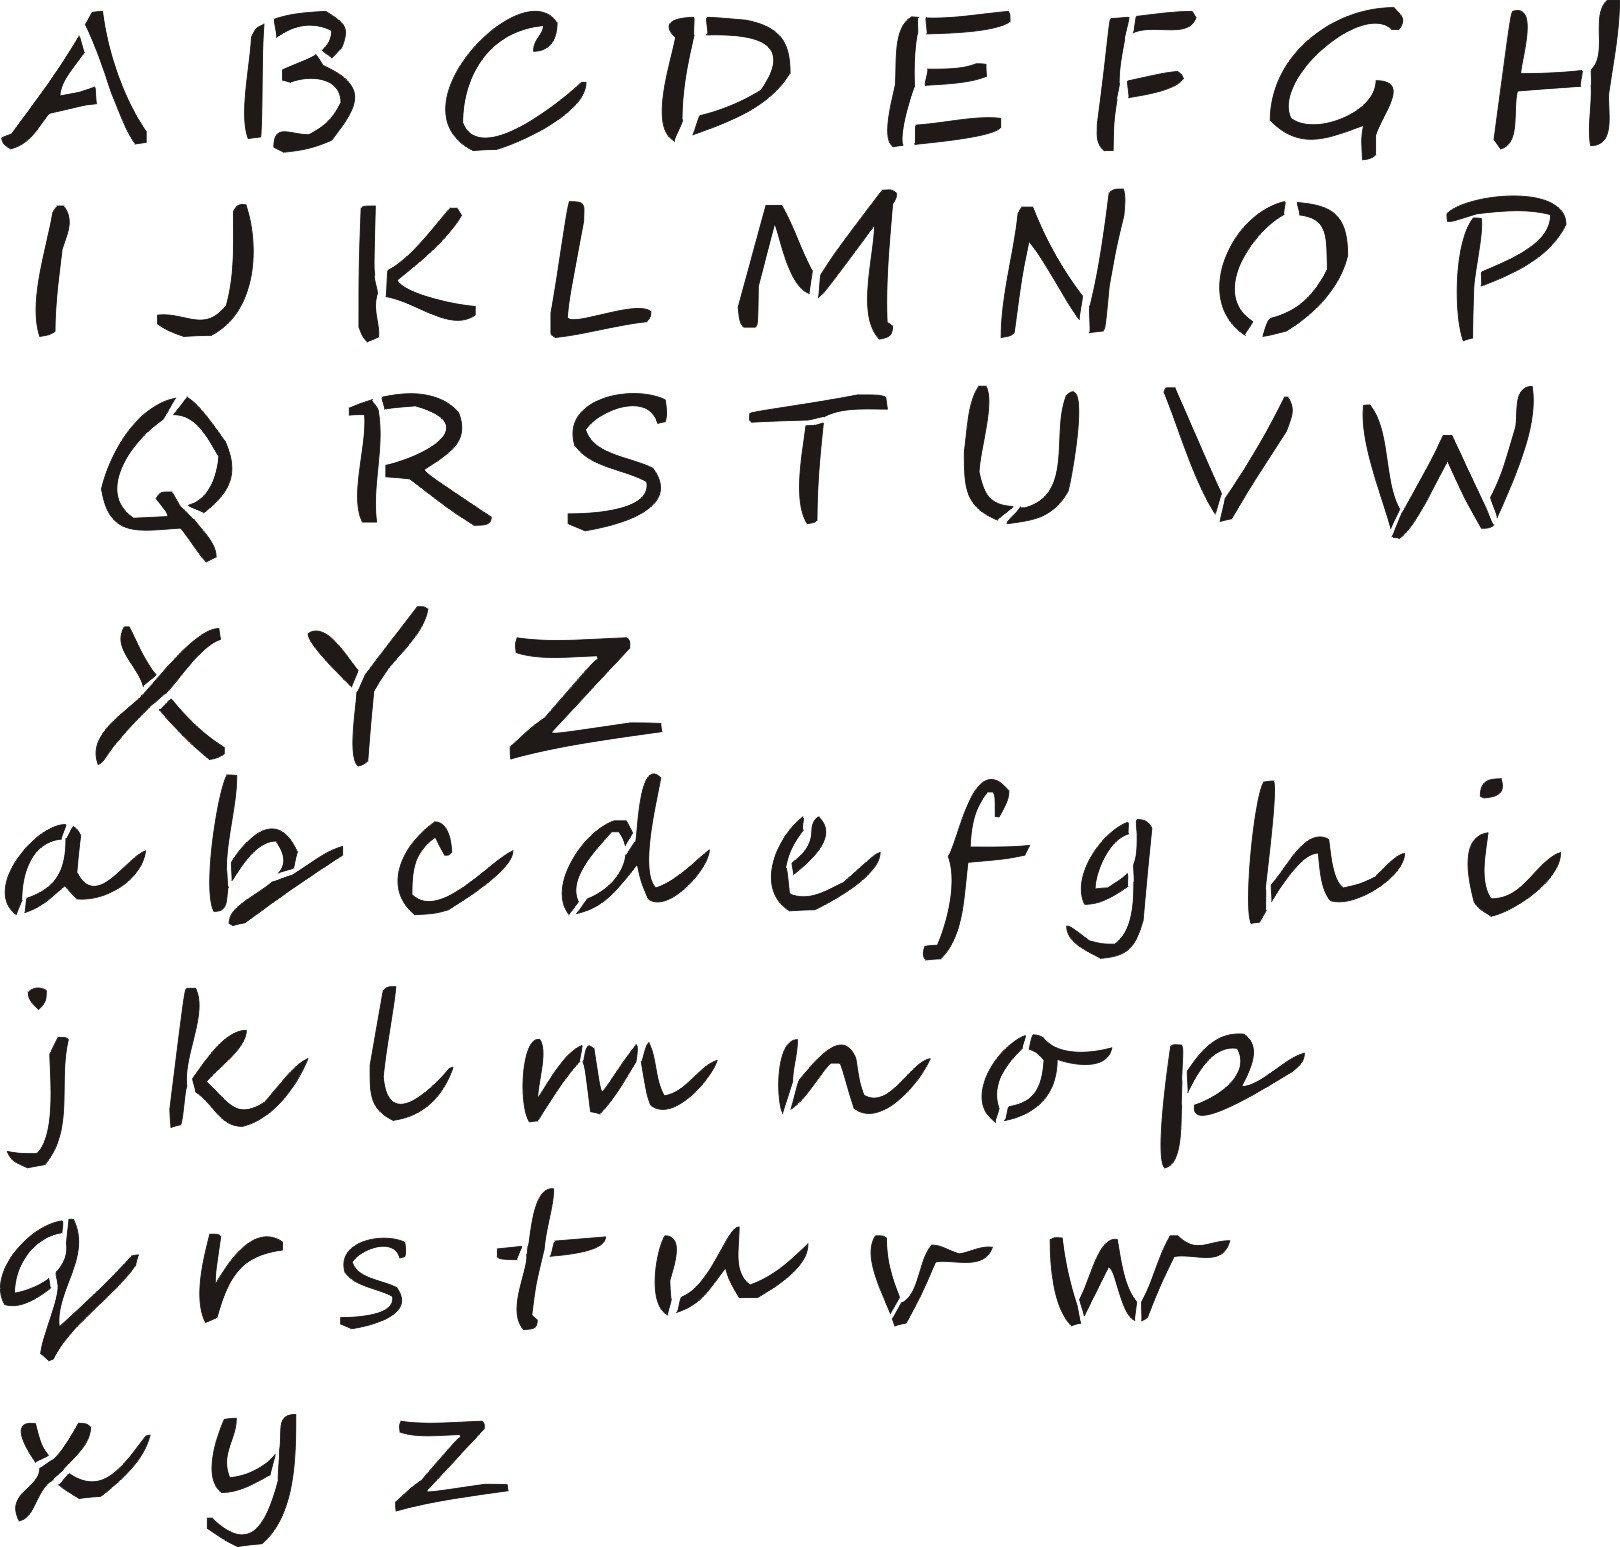 Alphabet Stencils for Painting Letter Stencil Farmhouse Style – Walls Stencils Plaster